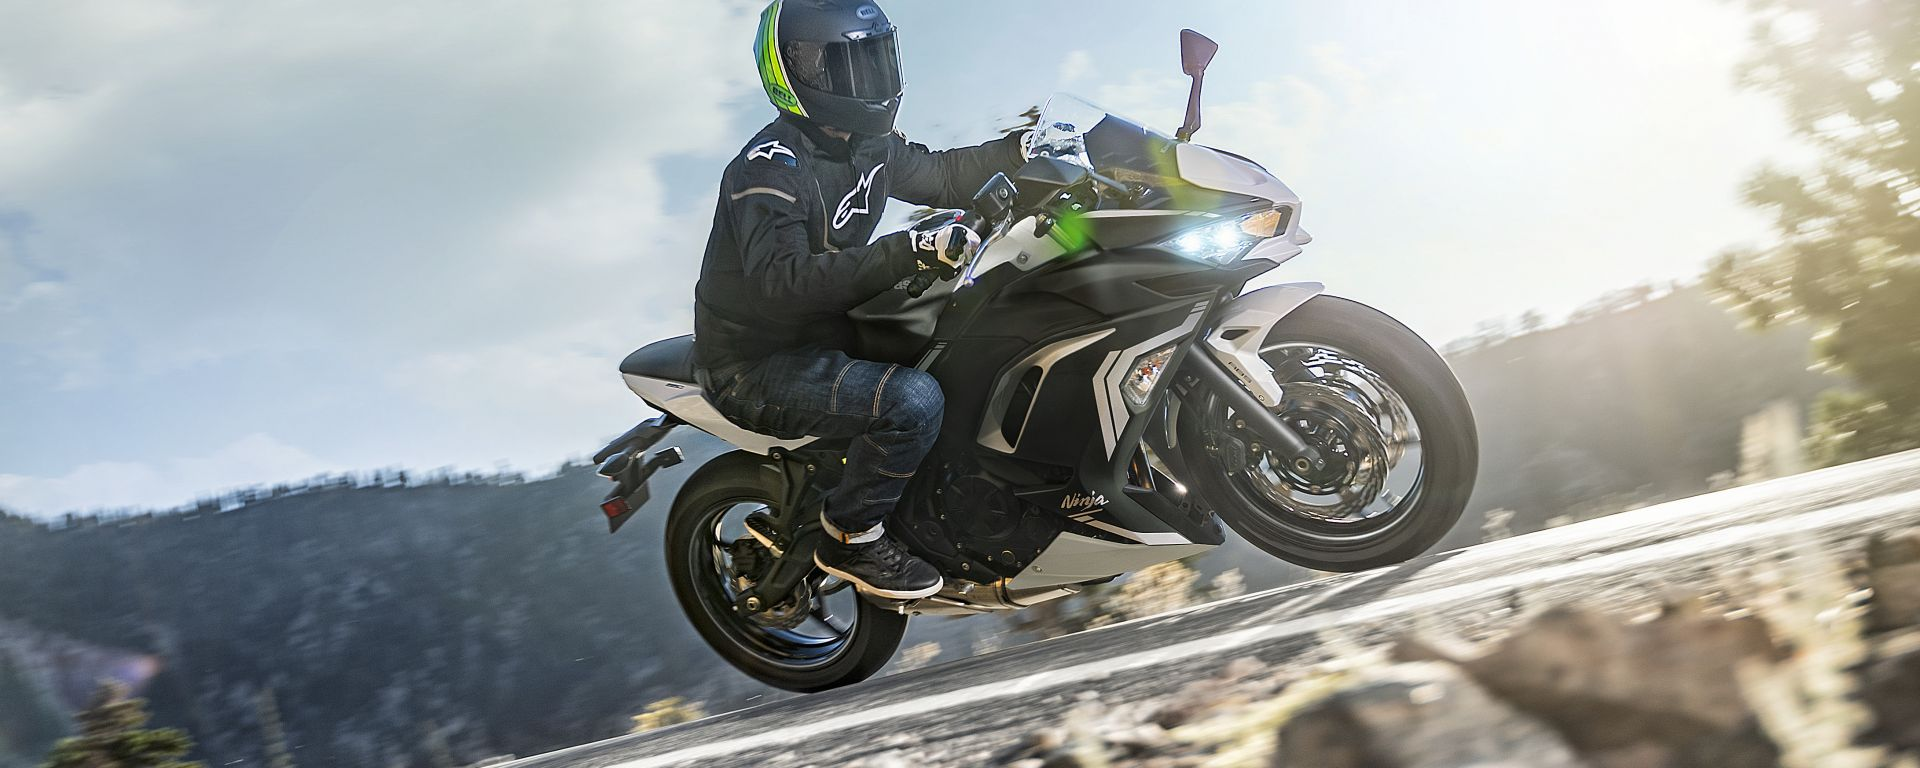 Nuova Kawasaki Ninja 650 2020: vista laterale